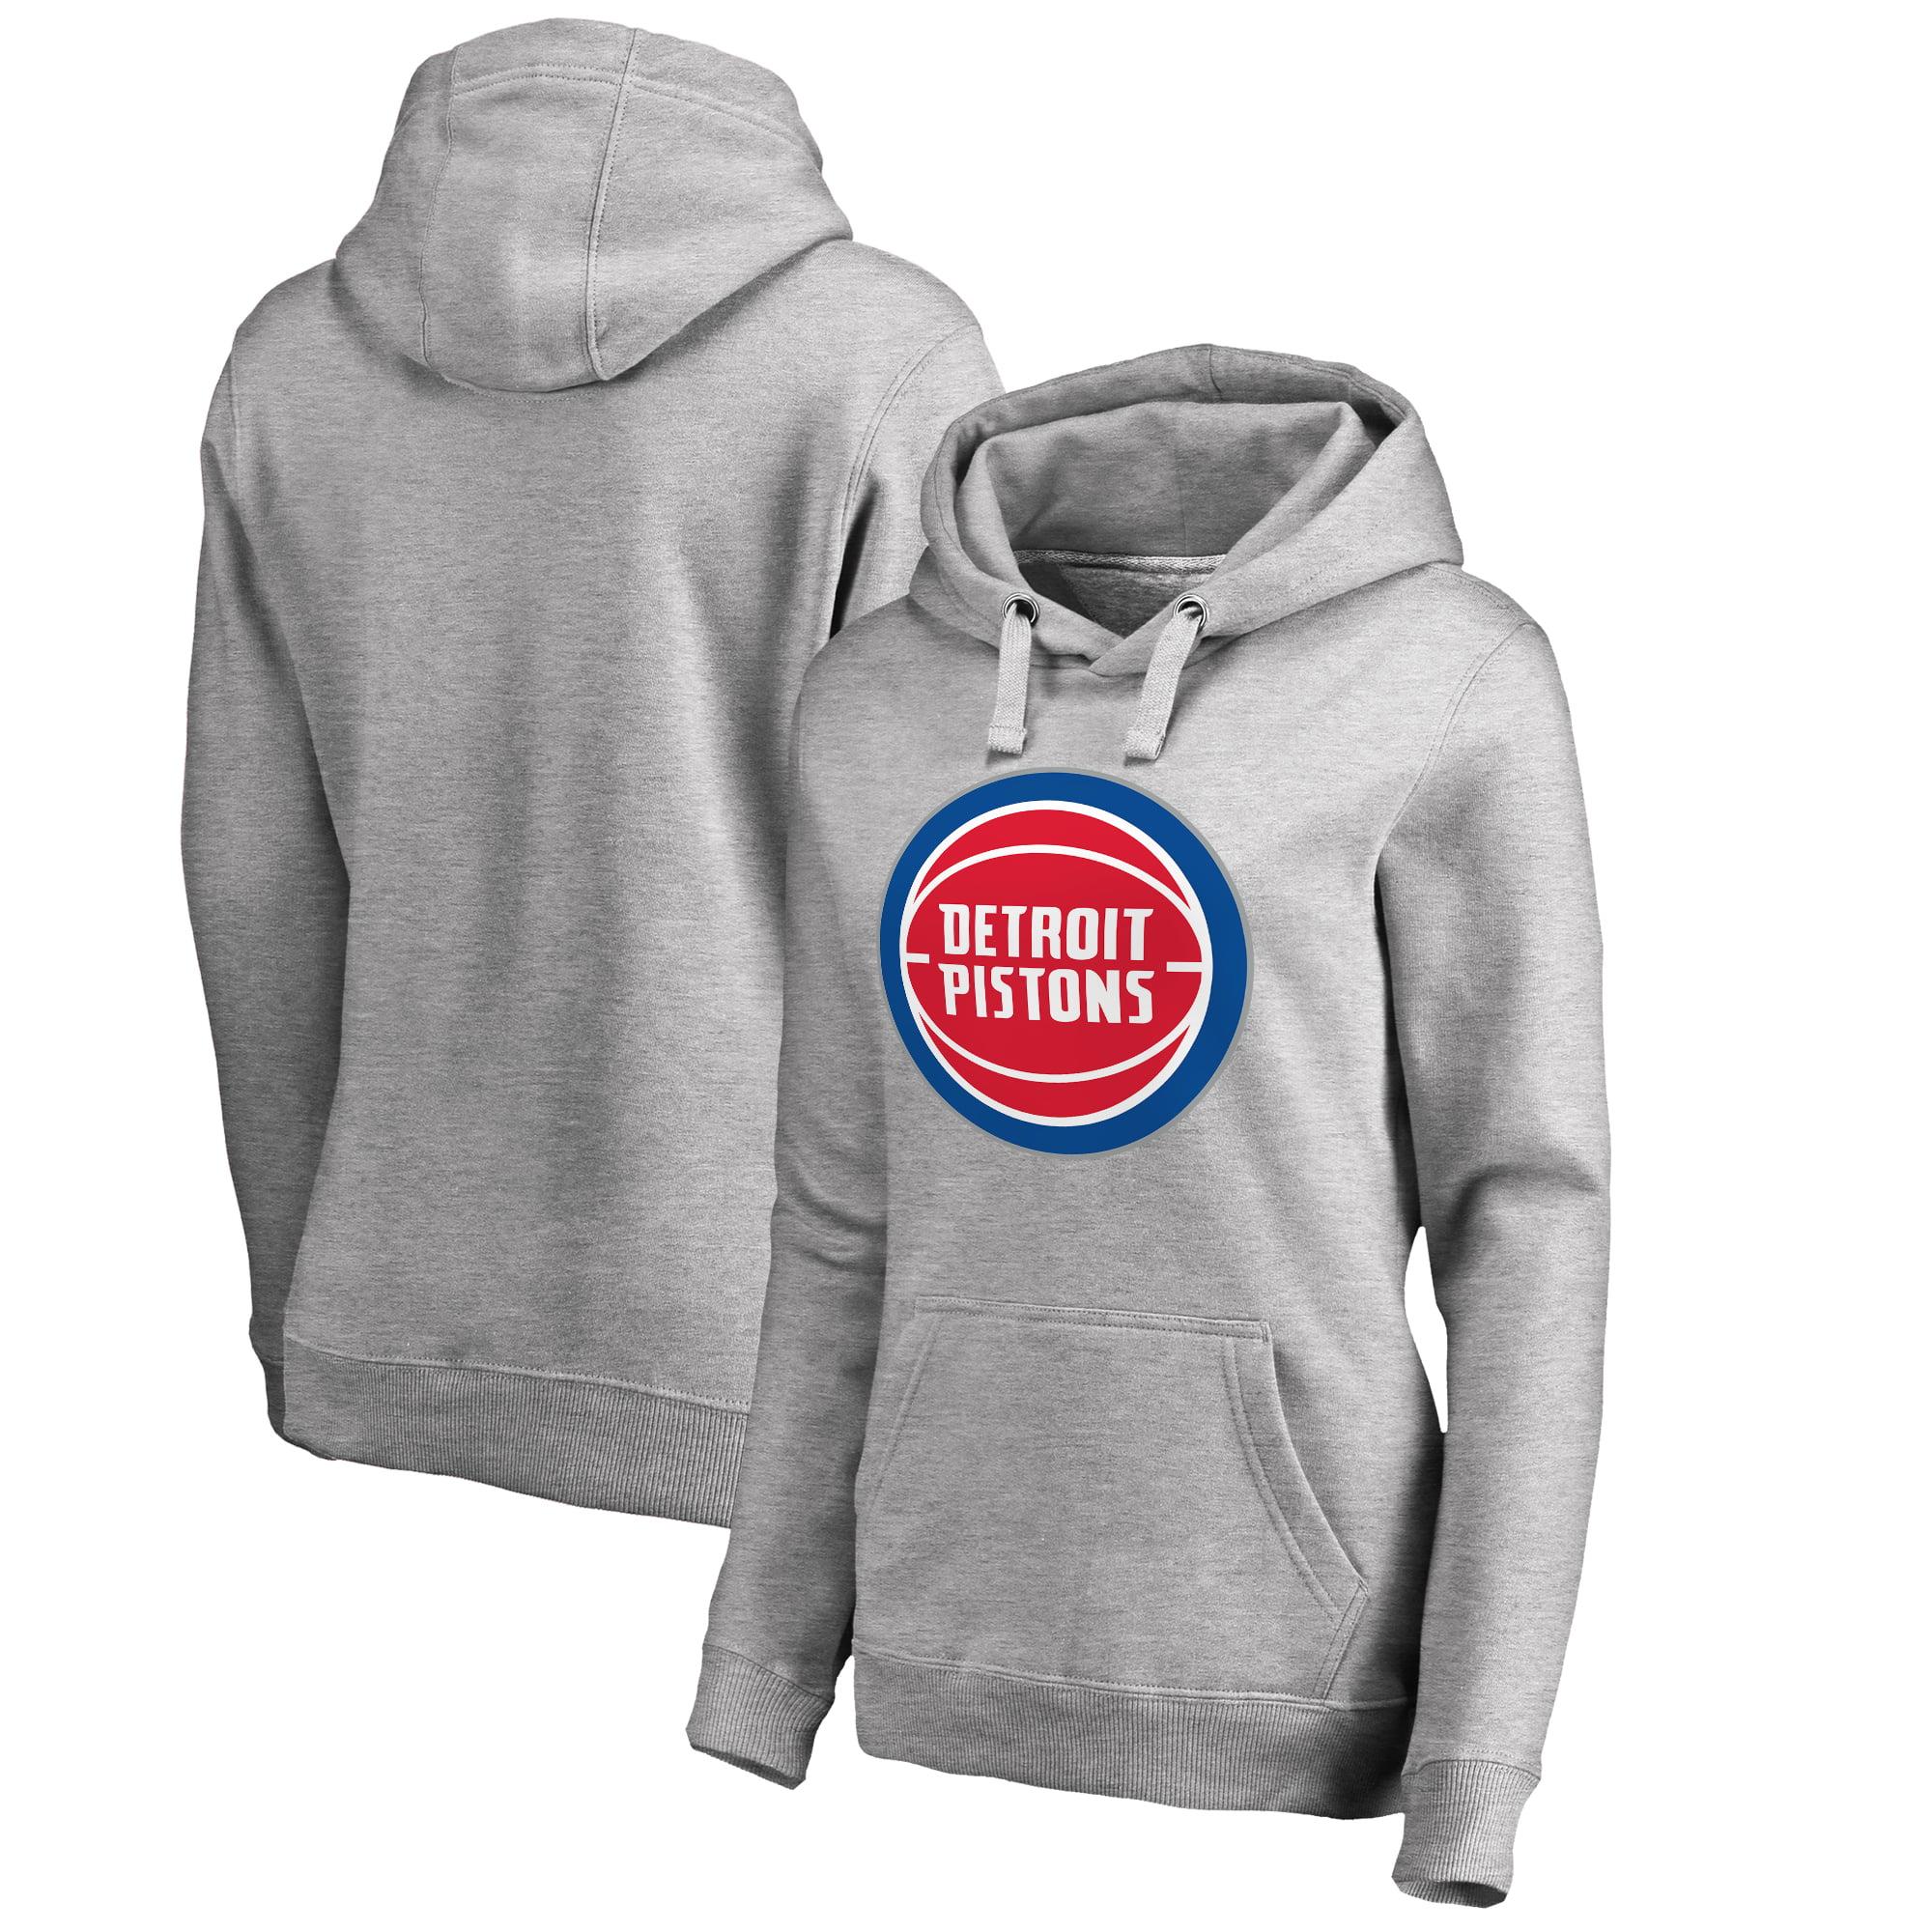 Detroit Pistons Fanatics Branded Women's Primary Logo Pullover Hoodie - Ash